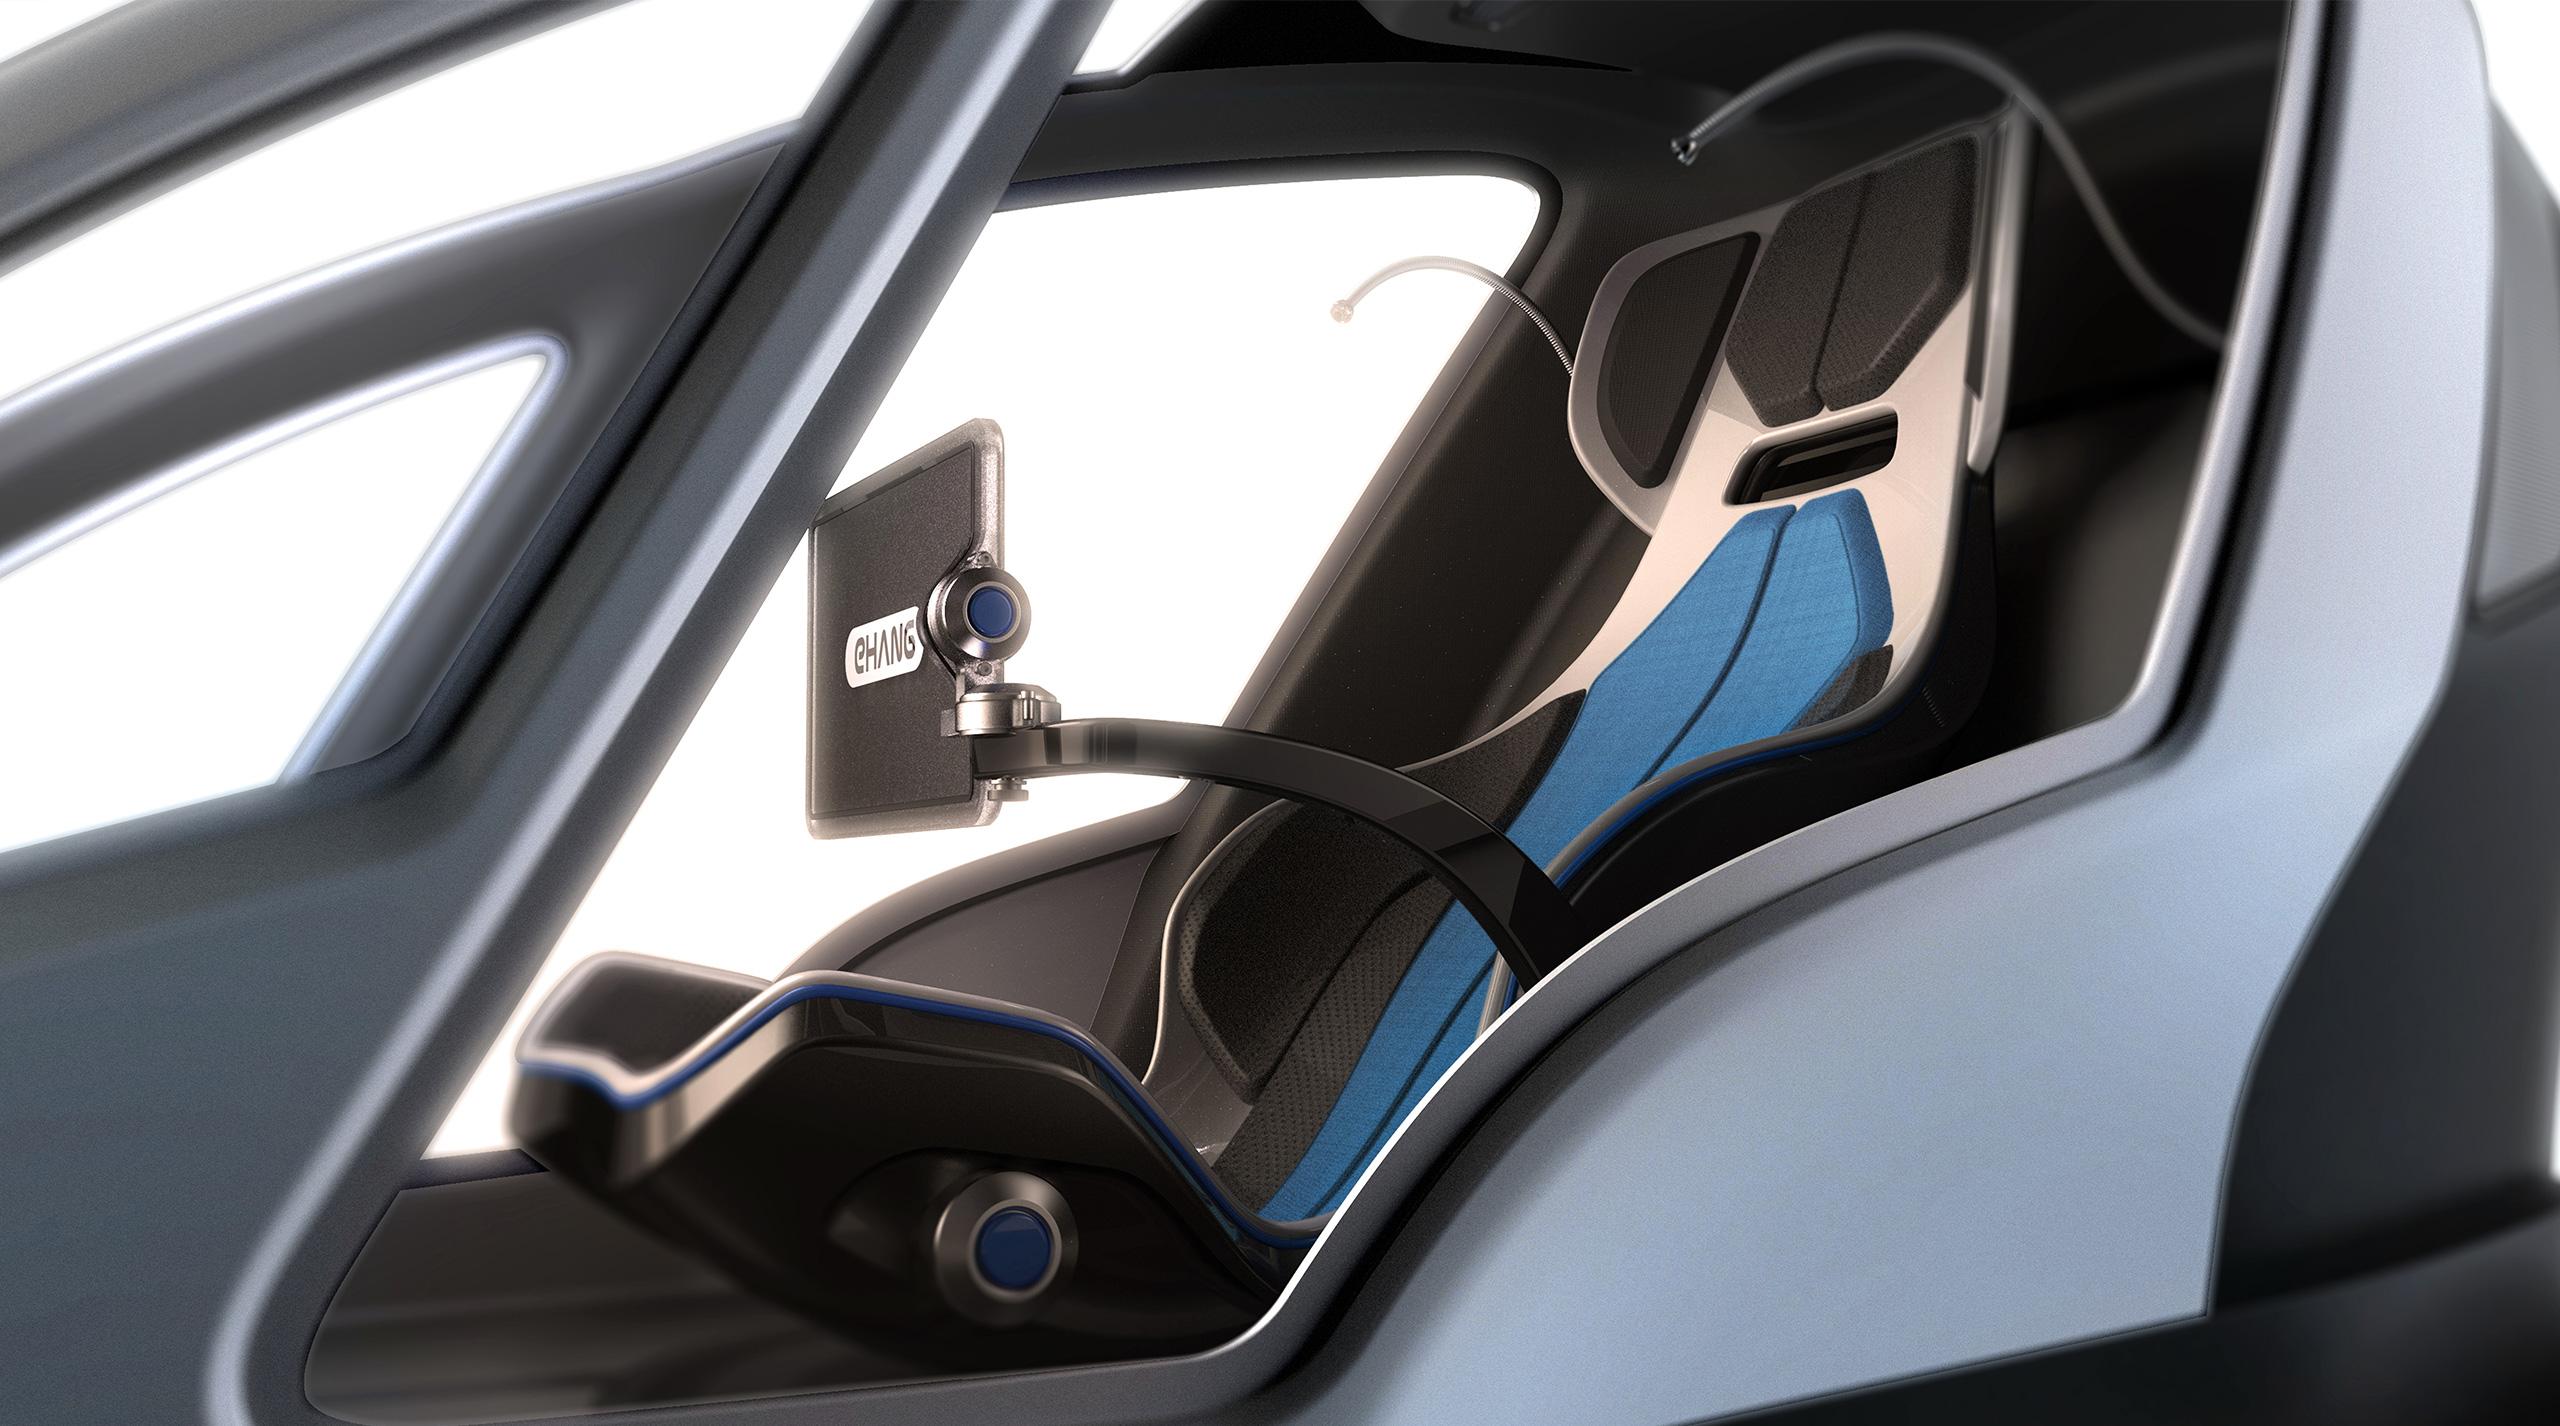 eHang Autonomous Aerial Vehicle